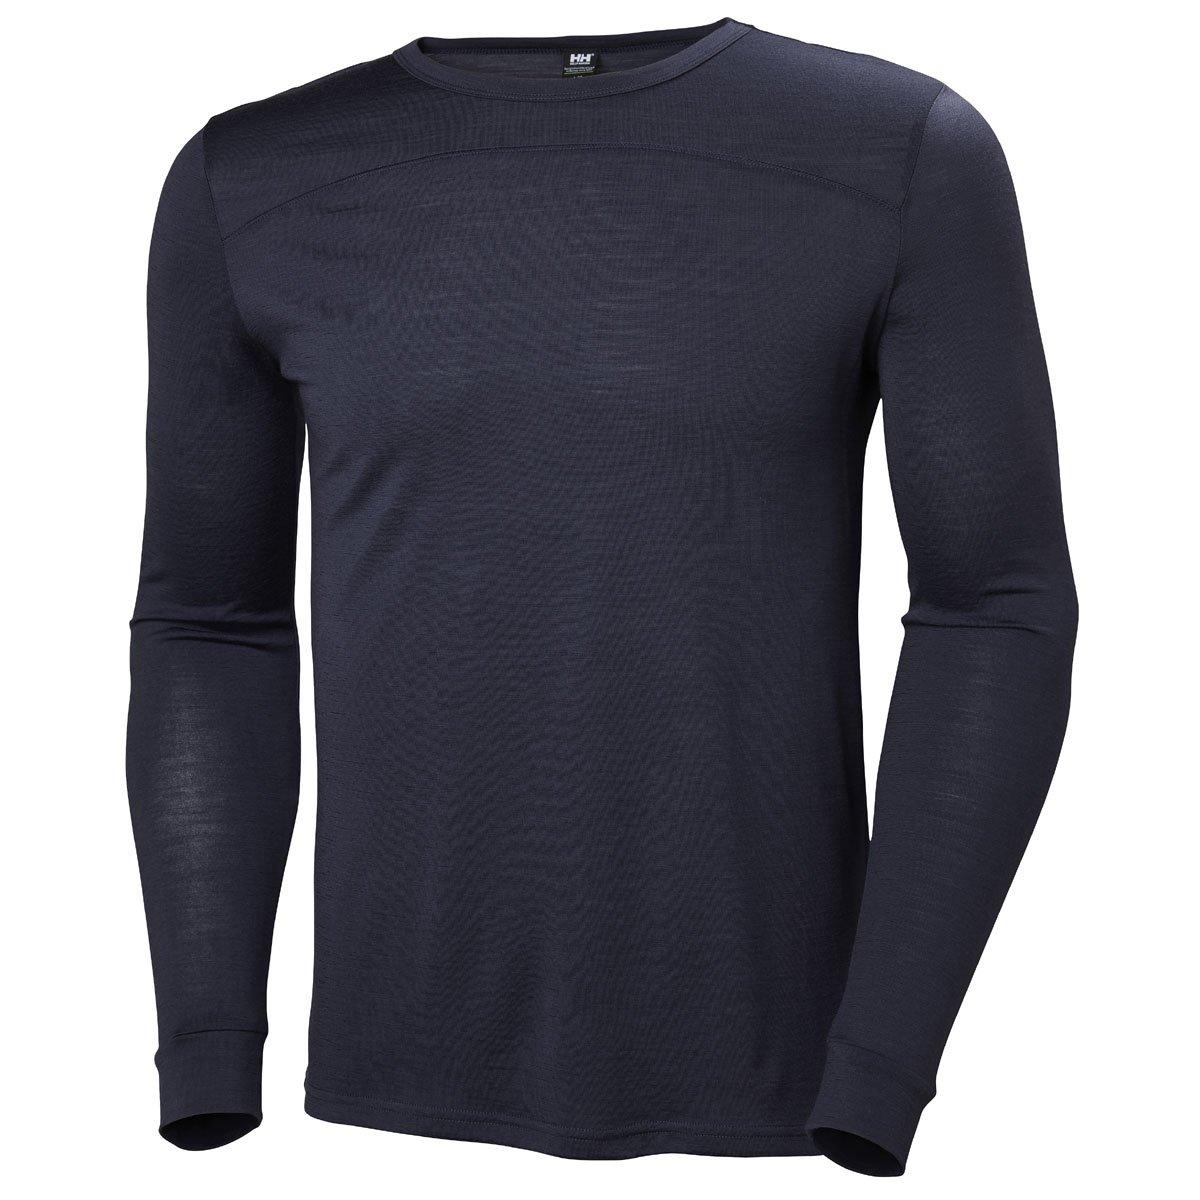 Helly Hansen Mens Merino Wool Mid Long-Sleeve Baselayer Top